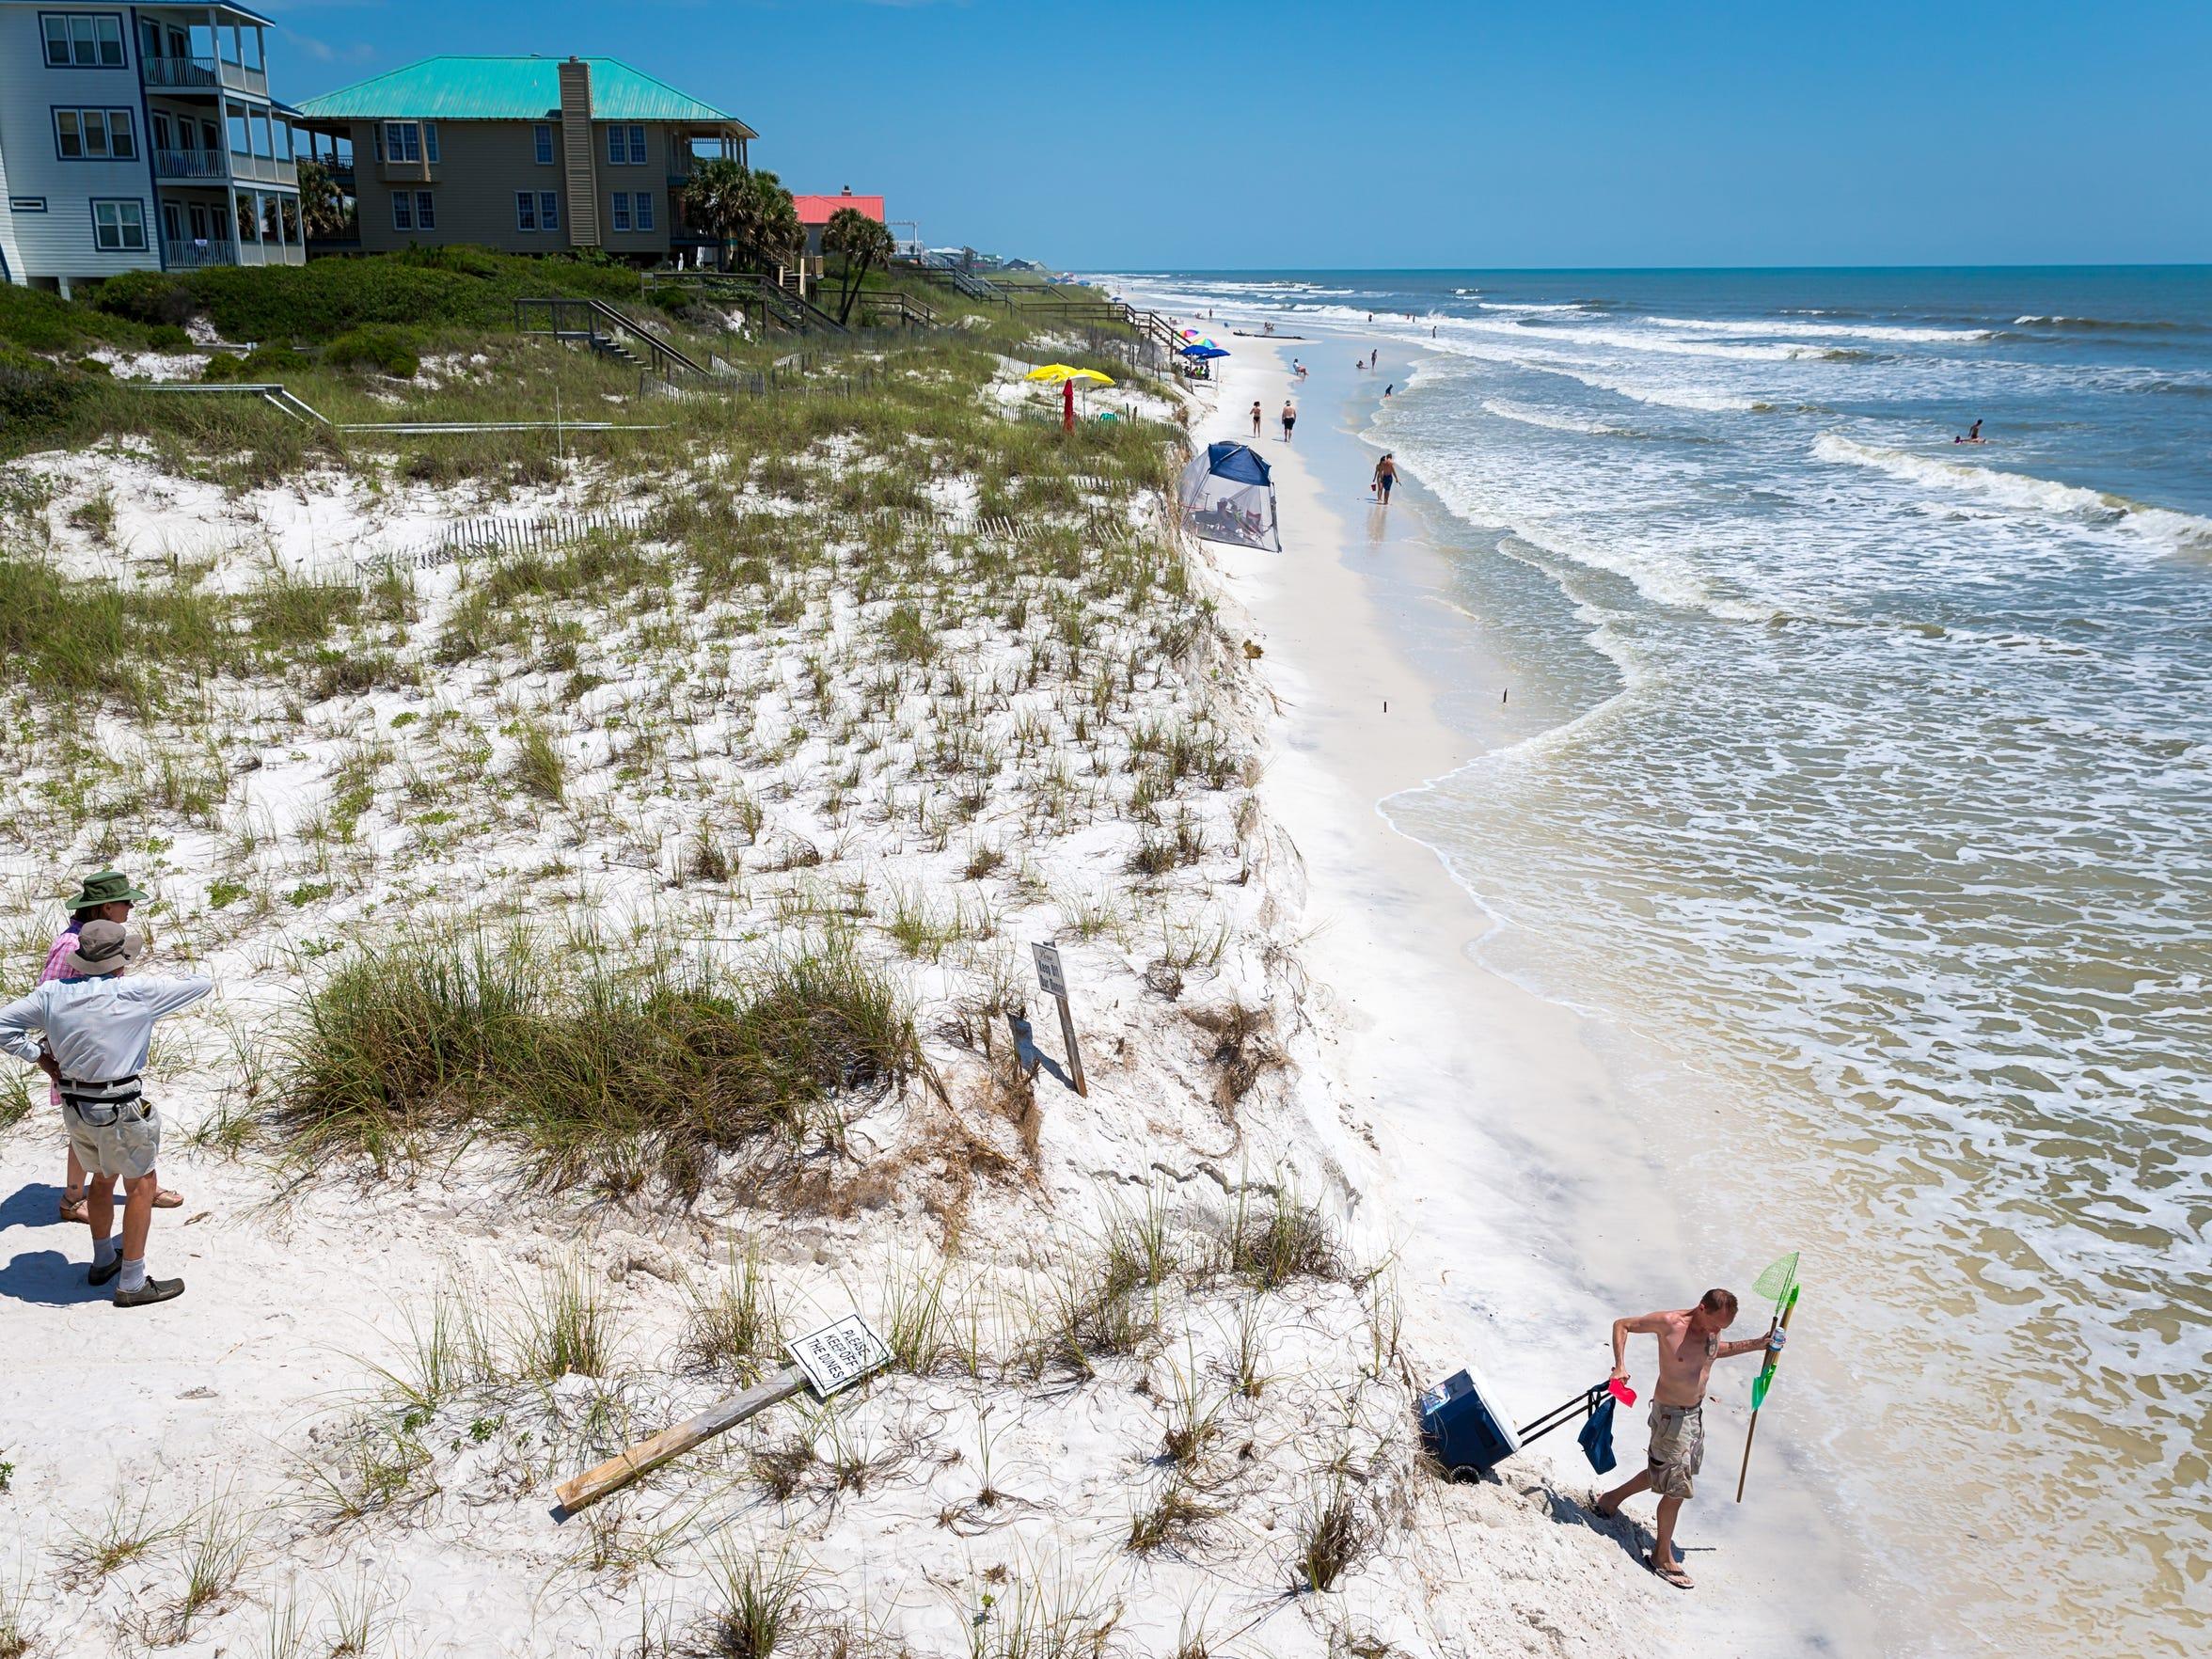 Beachgoers scale an embankment at a public beach access